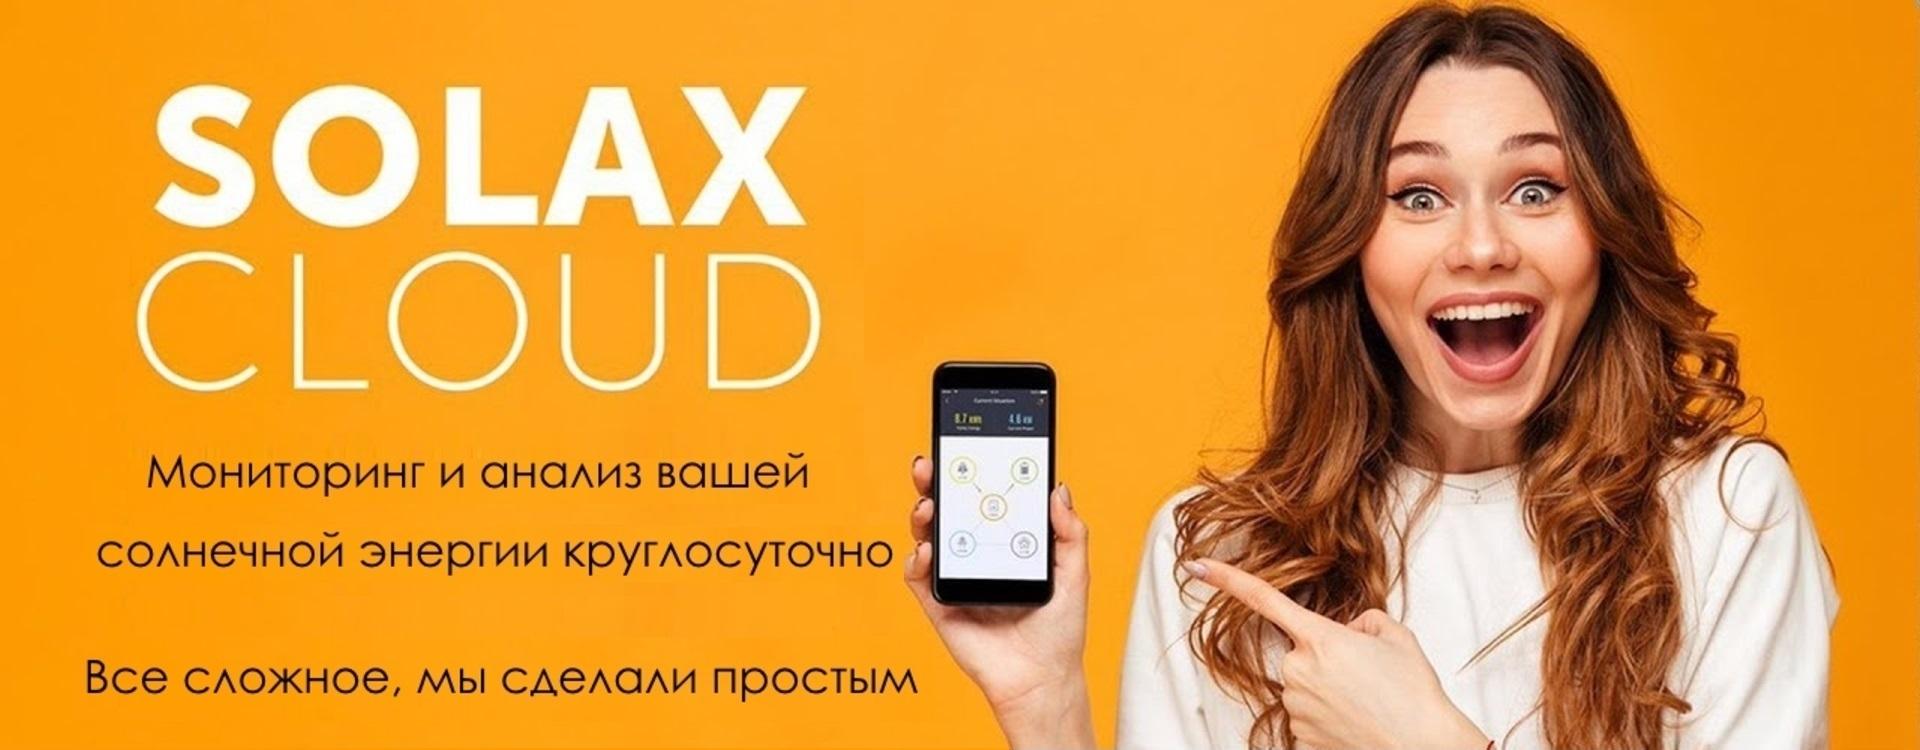 SolaX Cloud